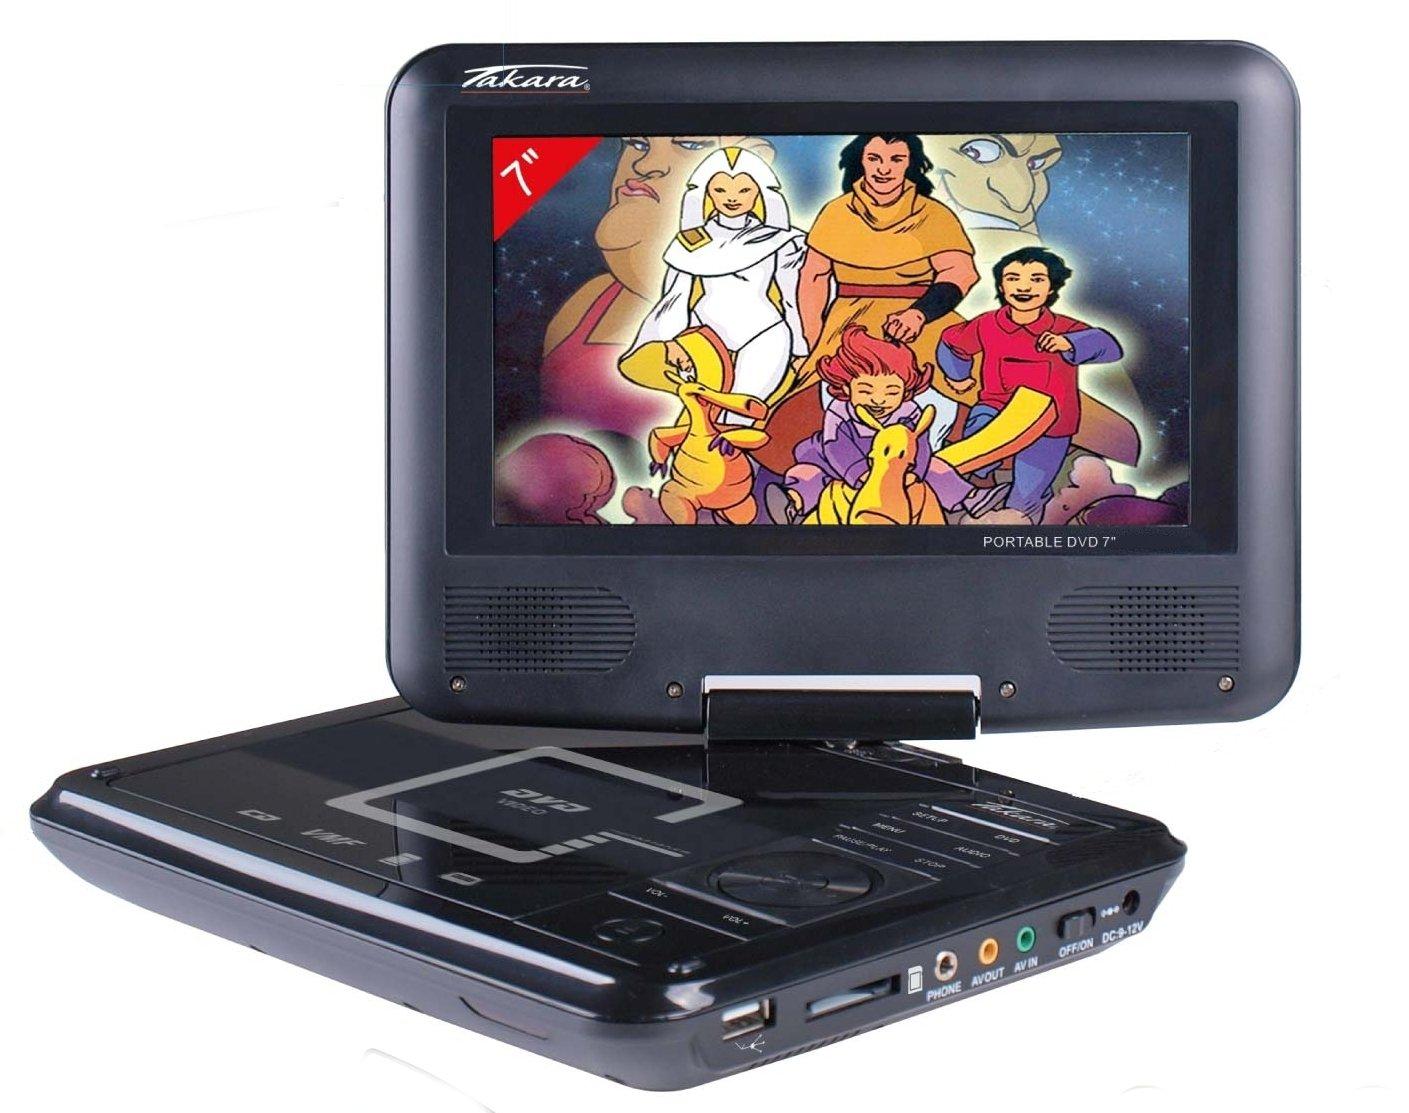 Lecteur DVD portable TAKARA VR122 NOIR